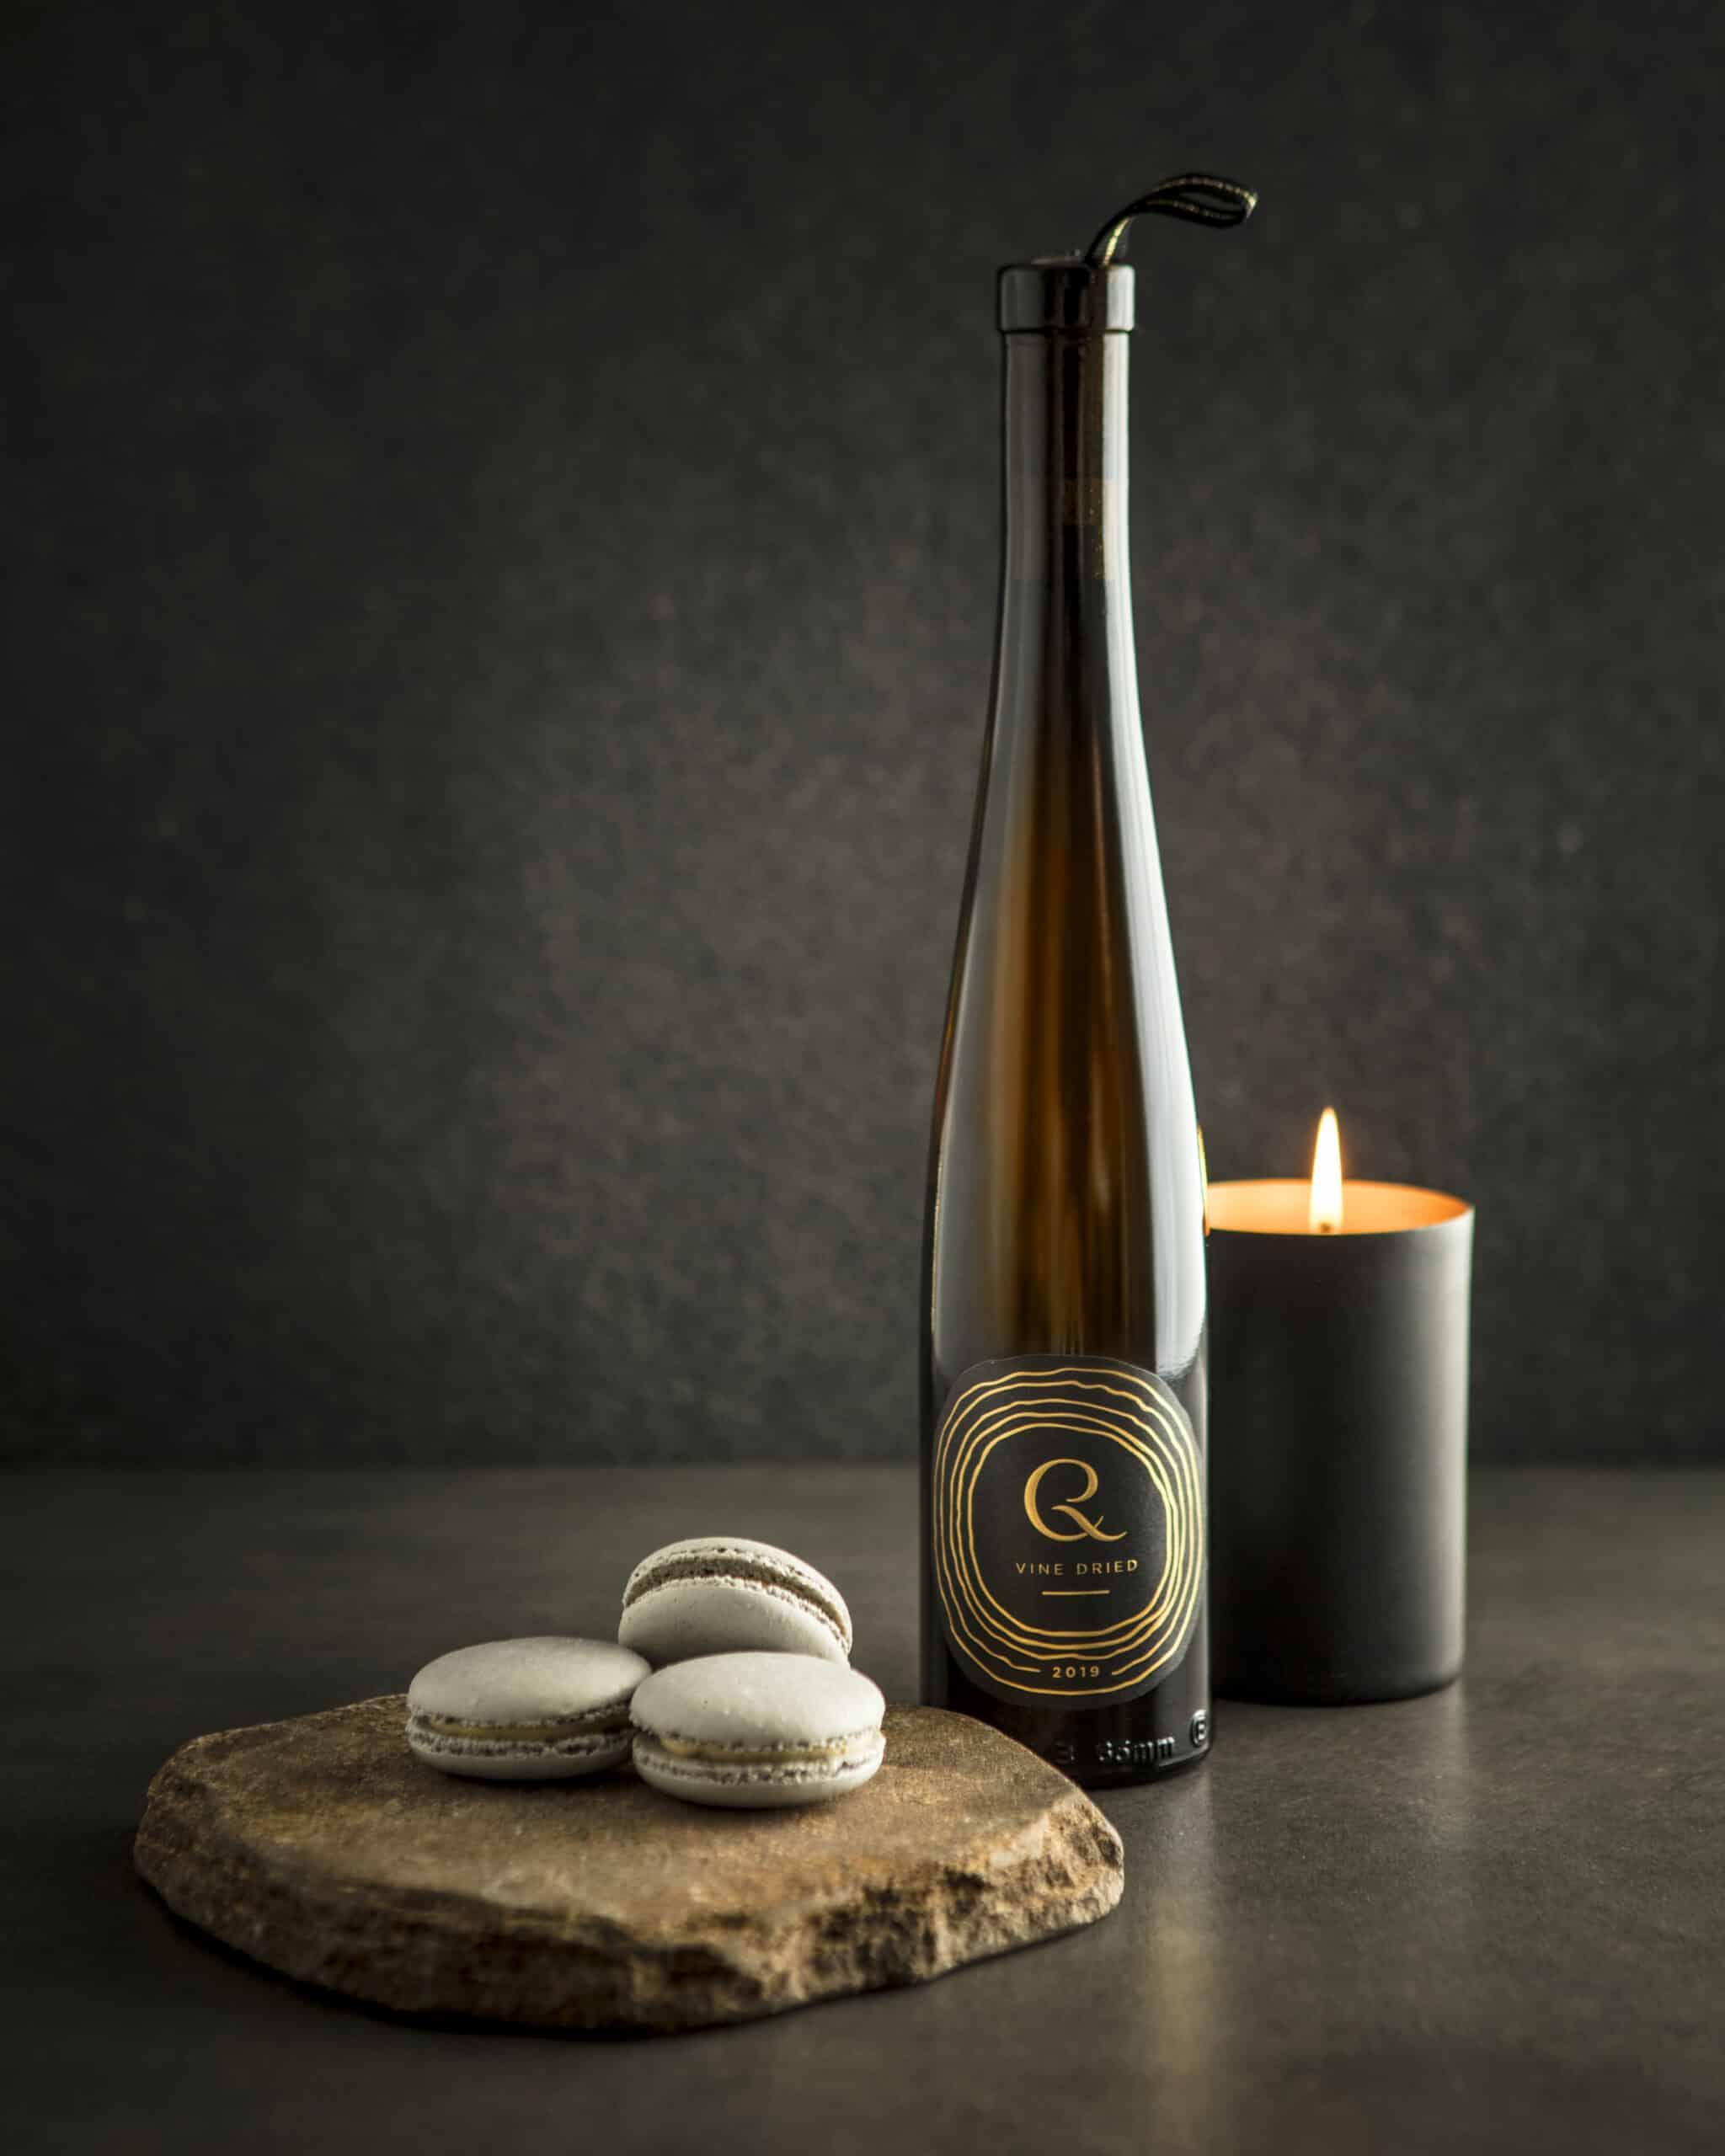 Quoin Rock Wine Estate's Looks To Raise The Bar Again With Vine Dried Sauvignon Blanc 2019 photo